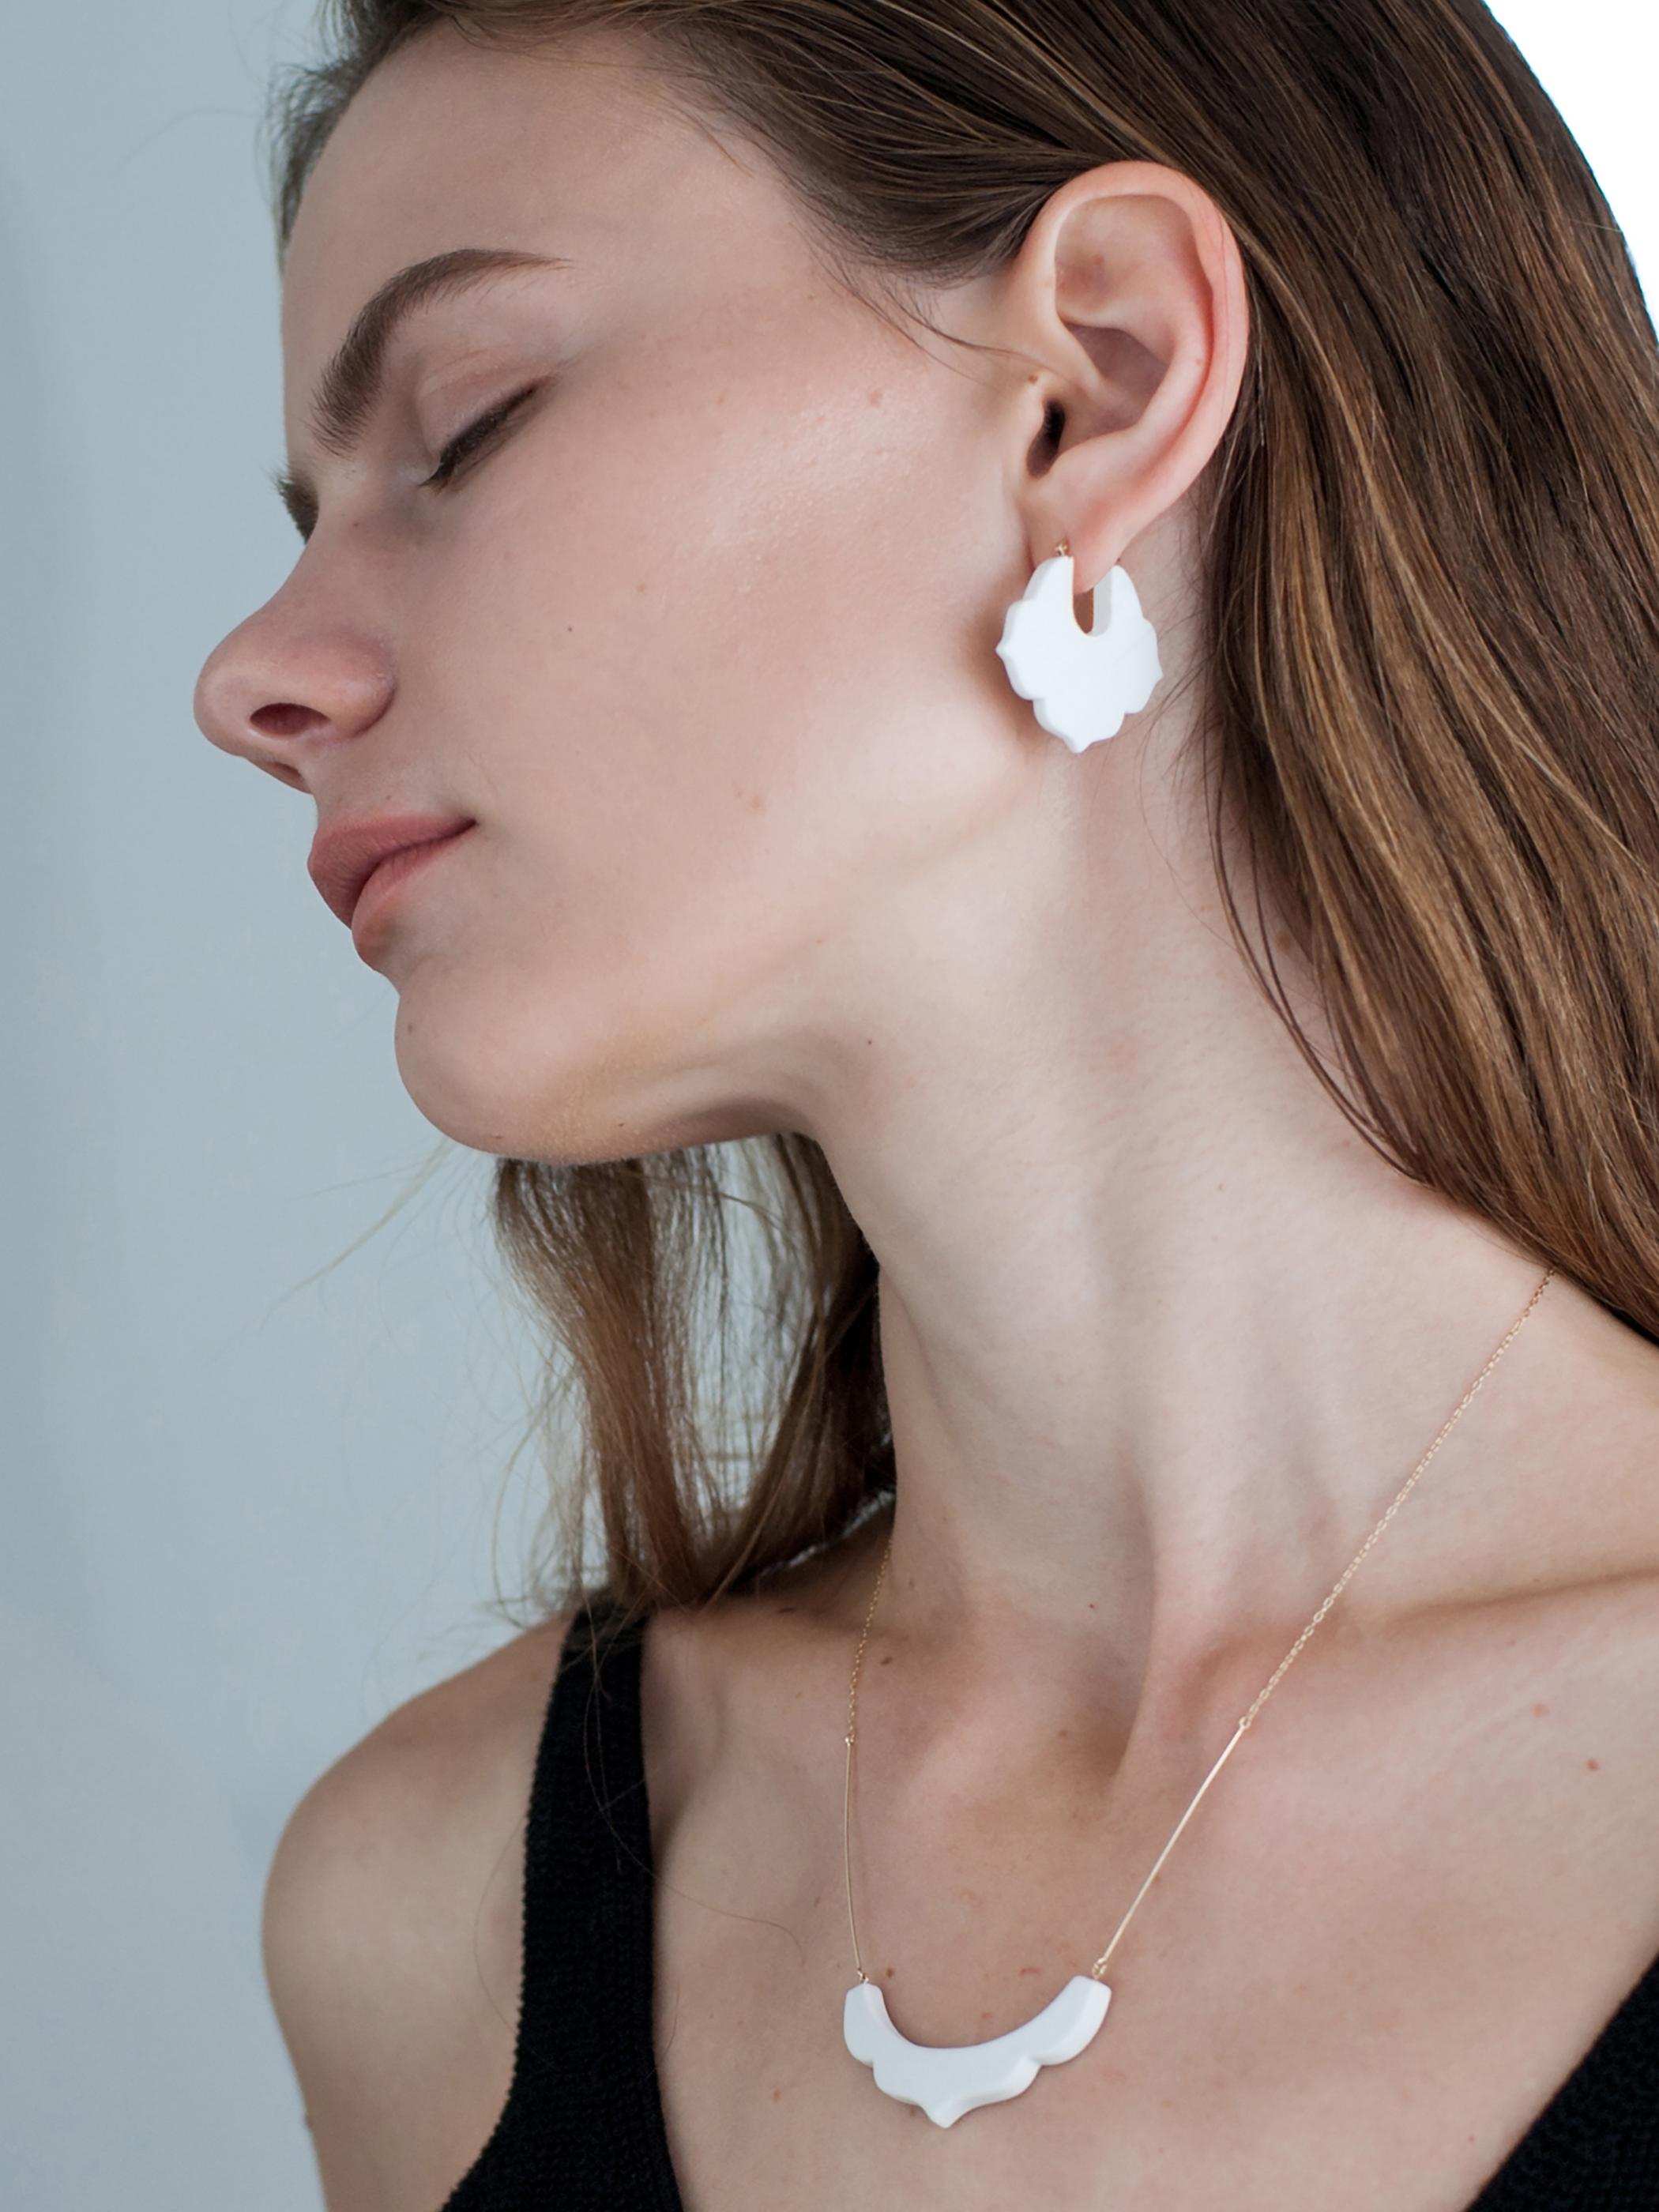 01 桔梗/Kikyou Earrings - White